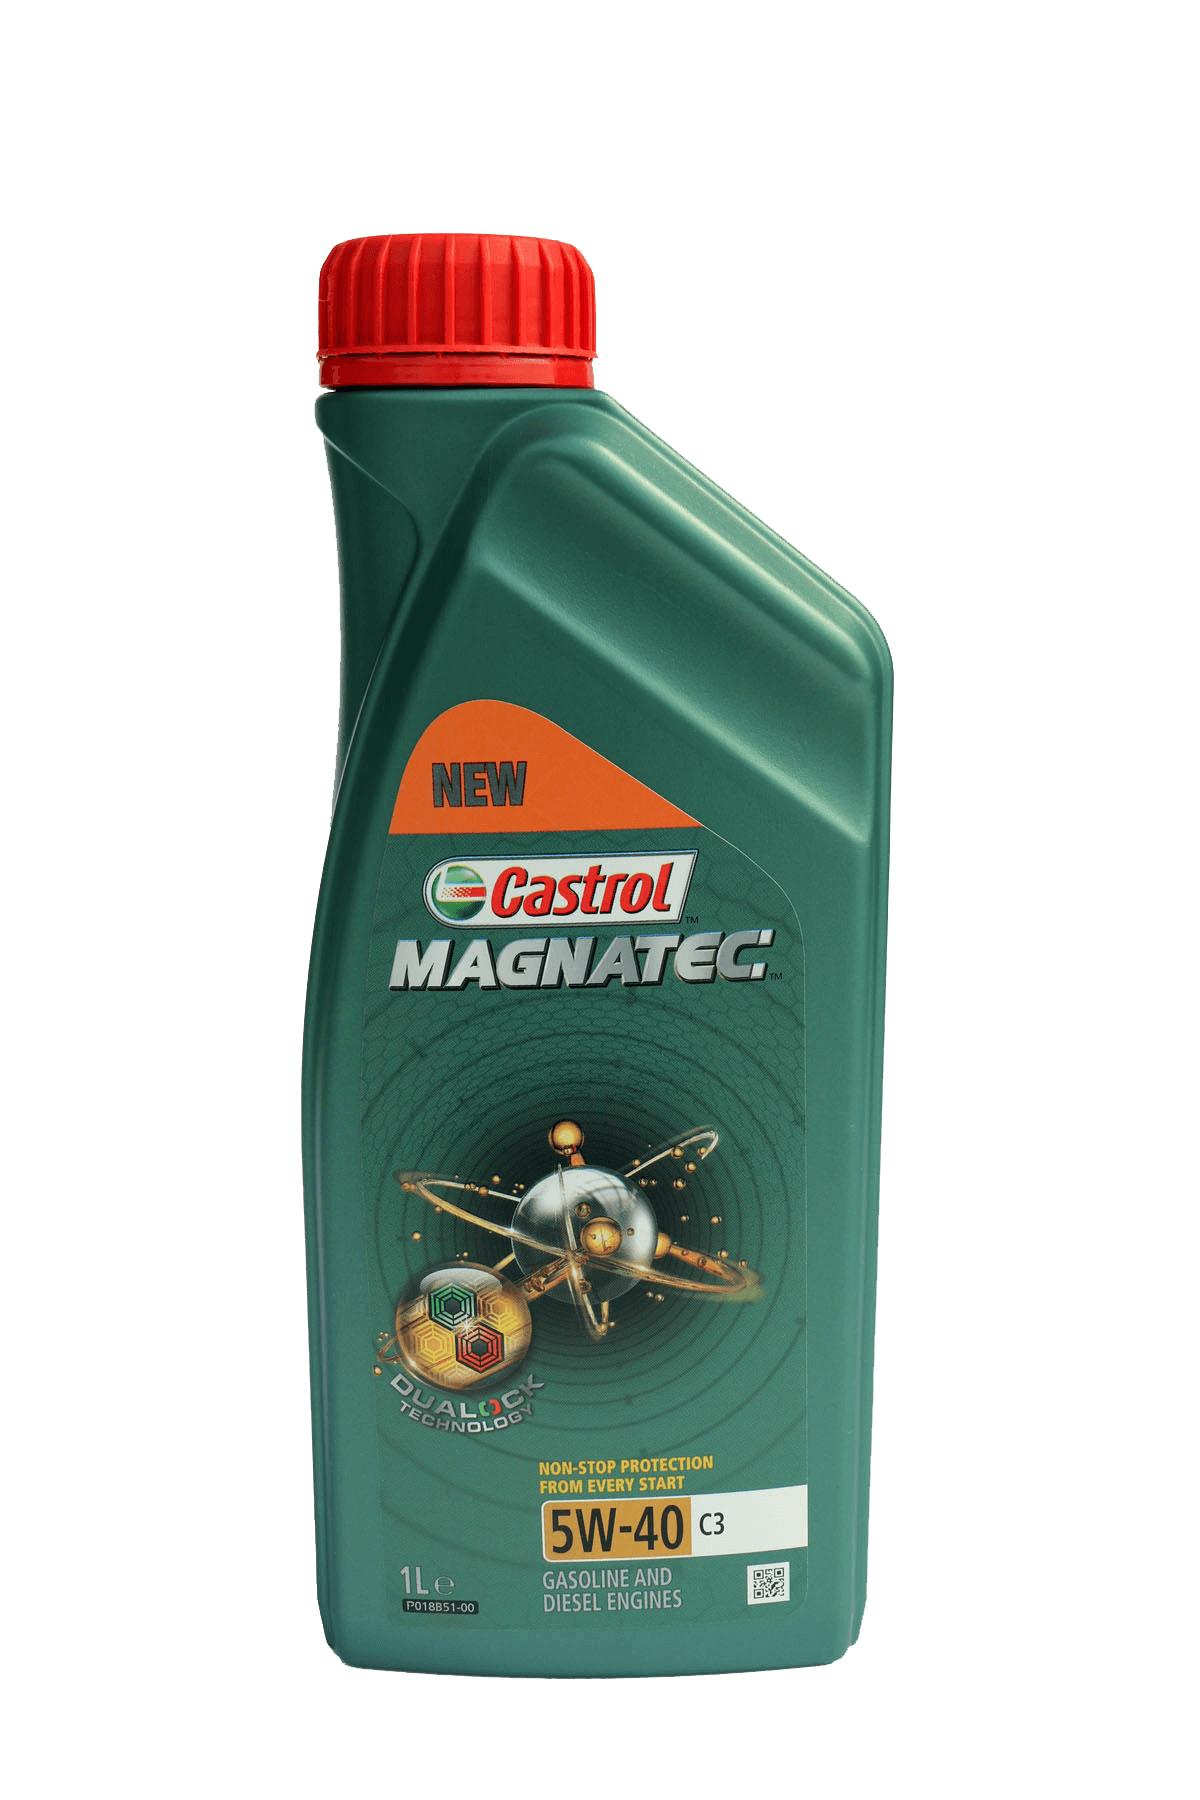 Castrol Magnatec 5W-40 C3 Motoröl, 1l